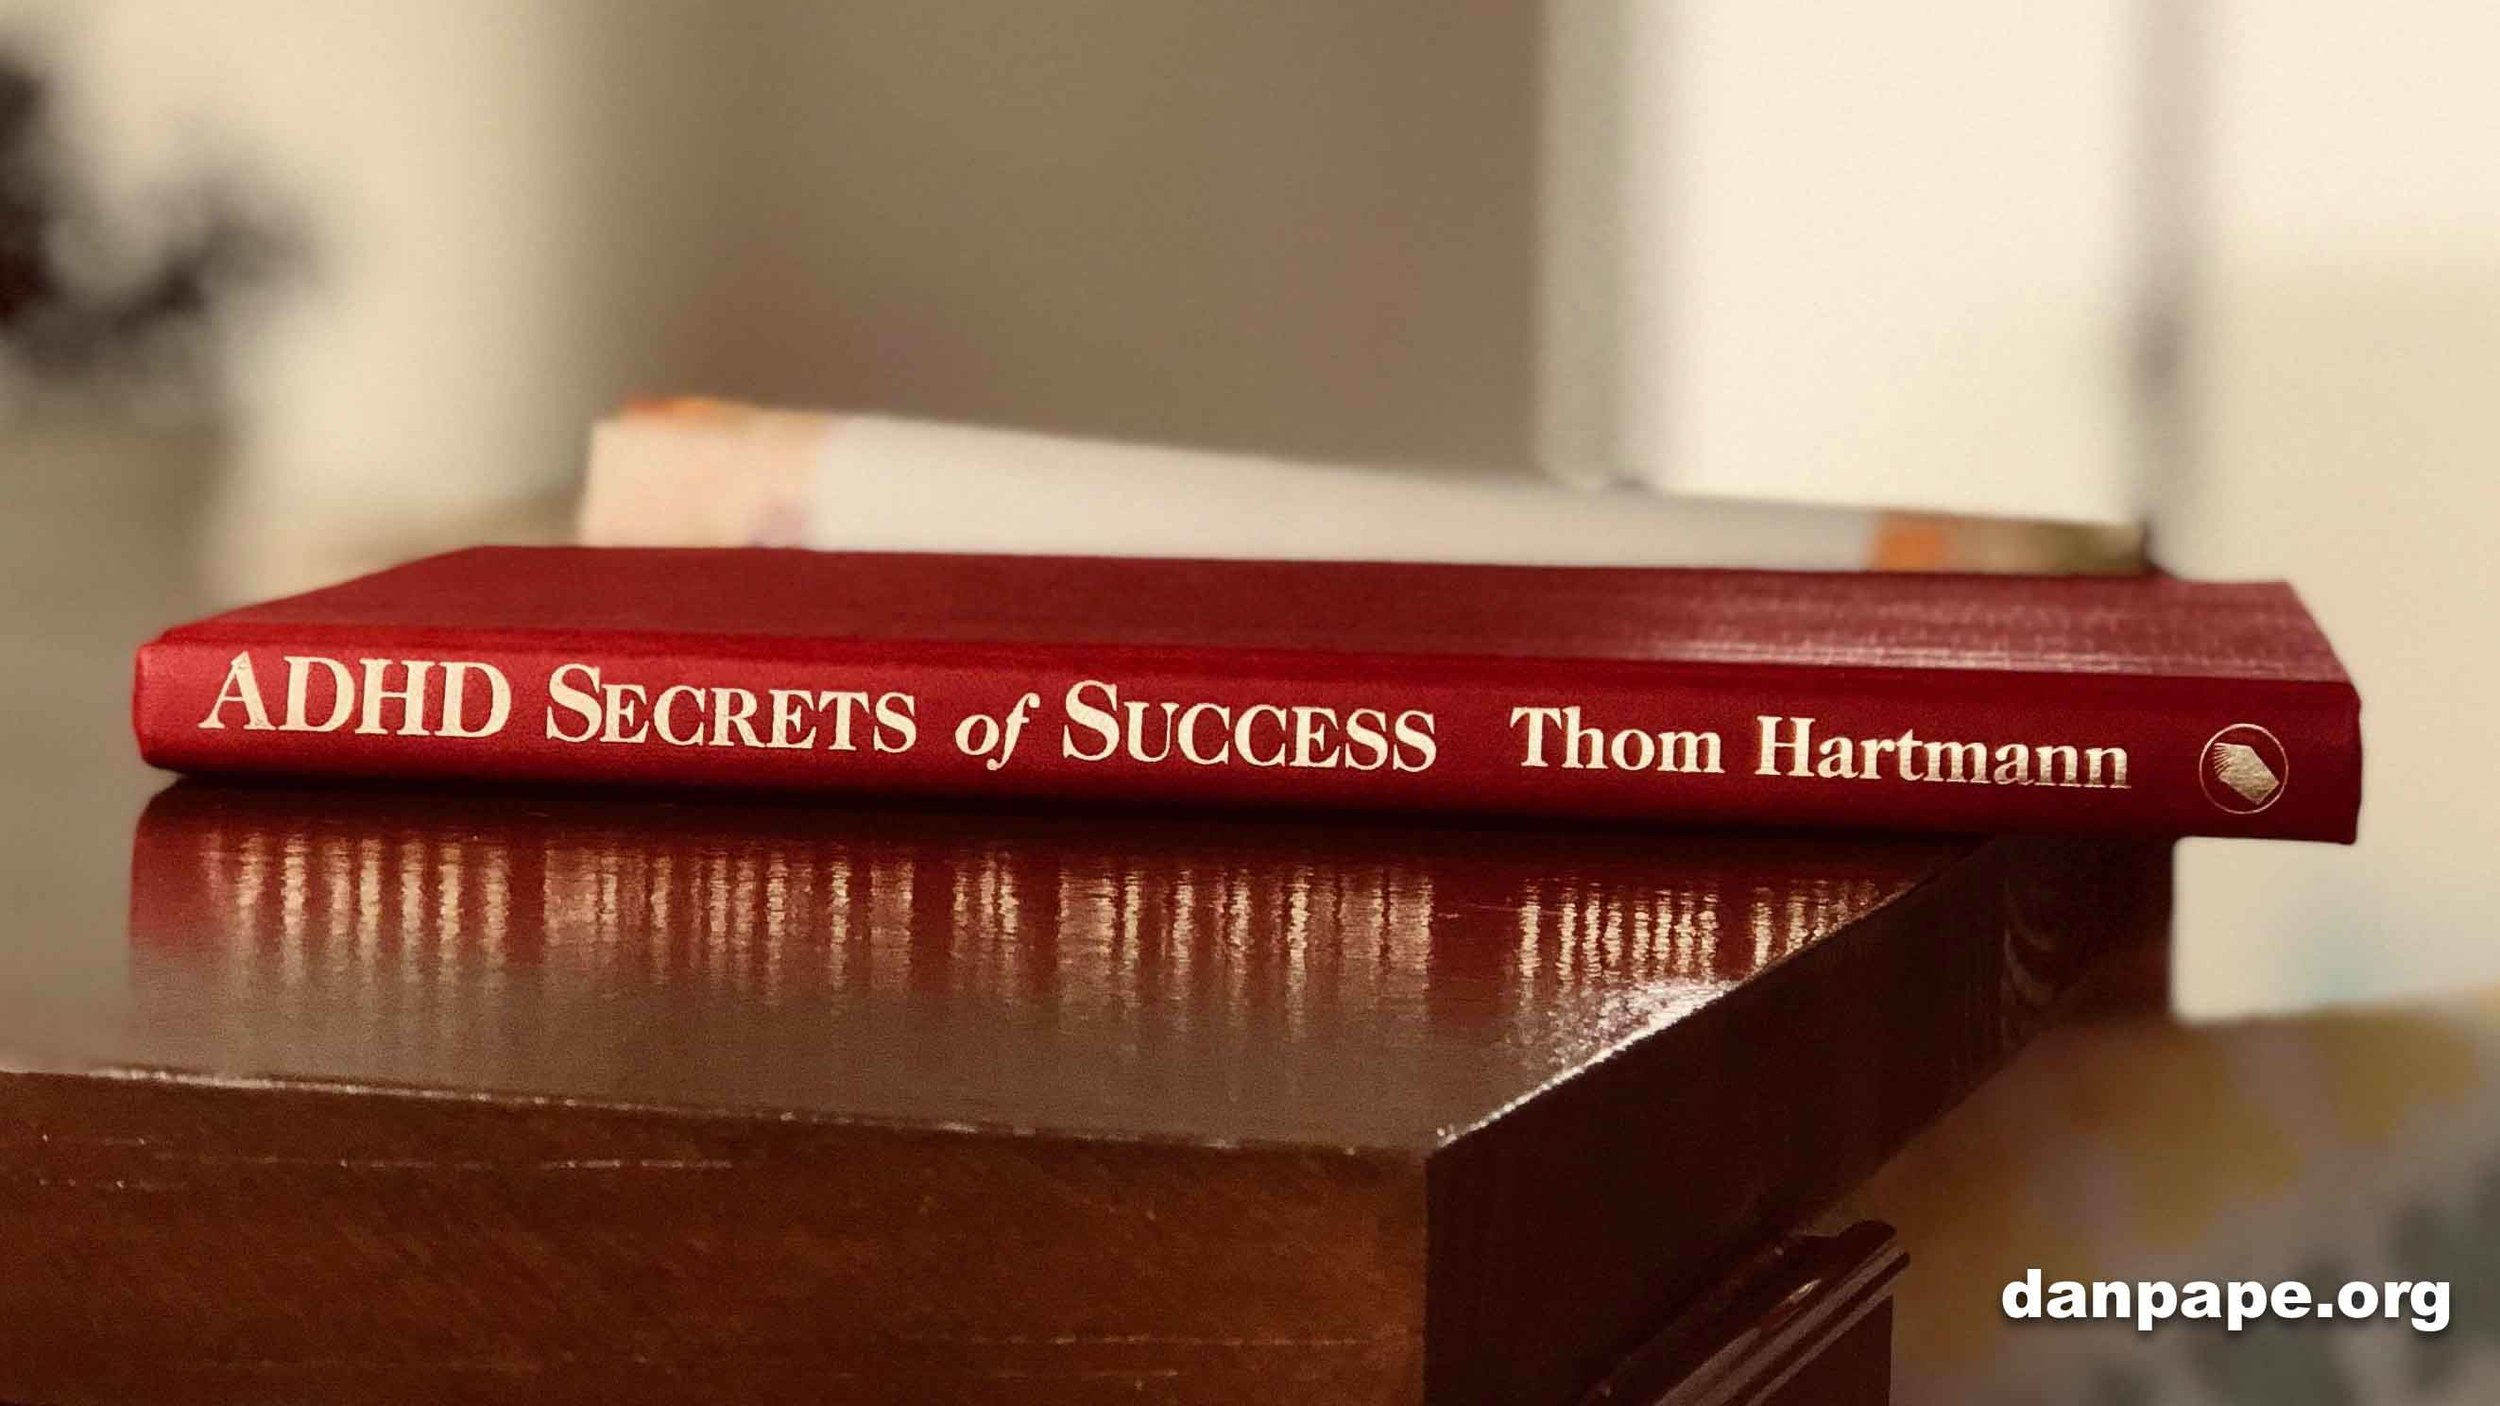 ADHD Secrets of Sucess by Thom Hartmann on danpape.org.jpg